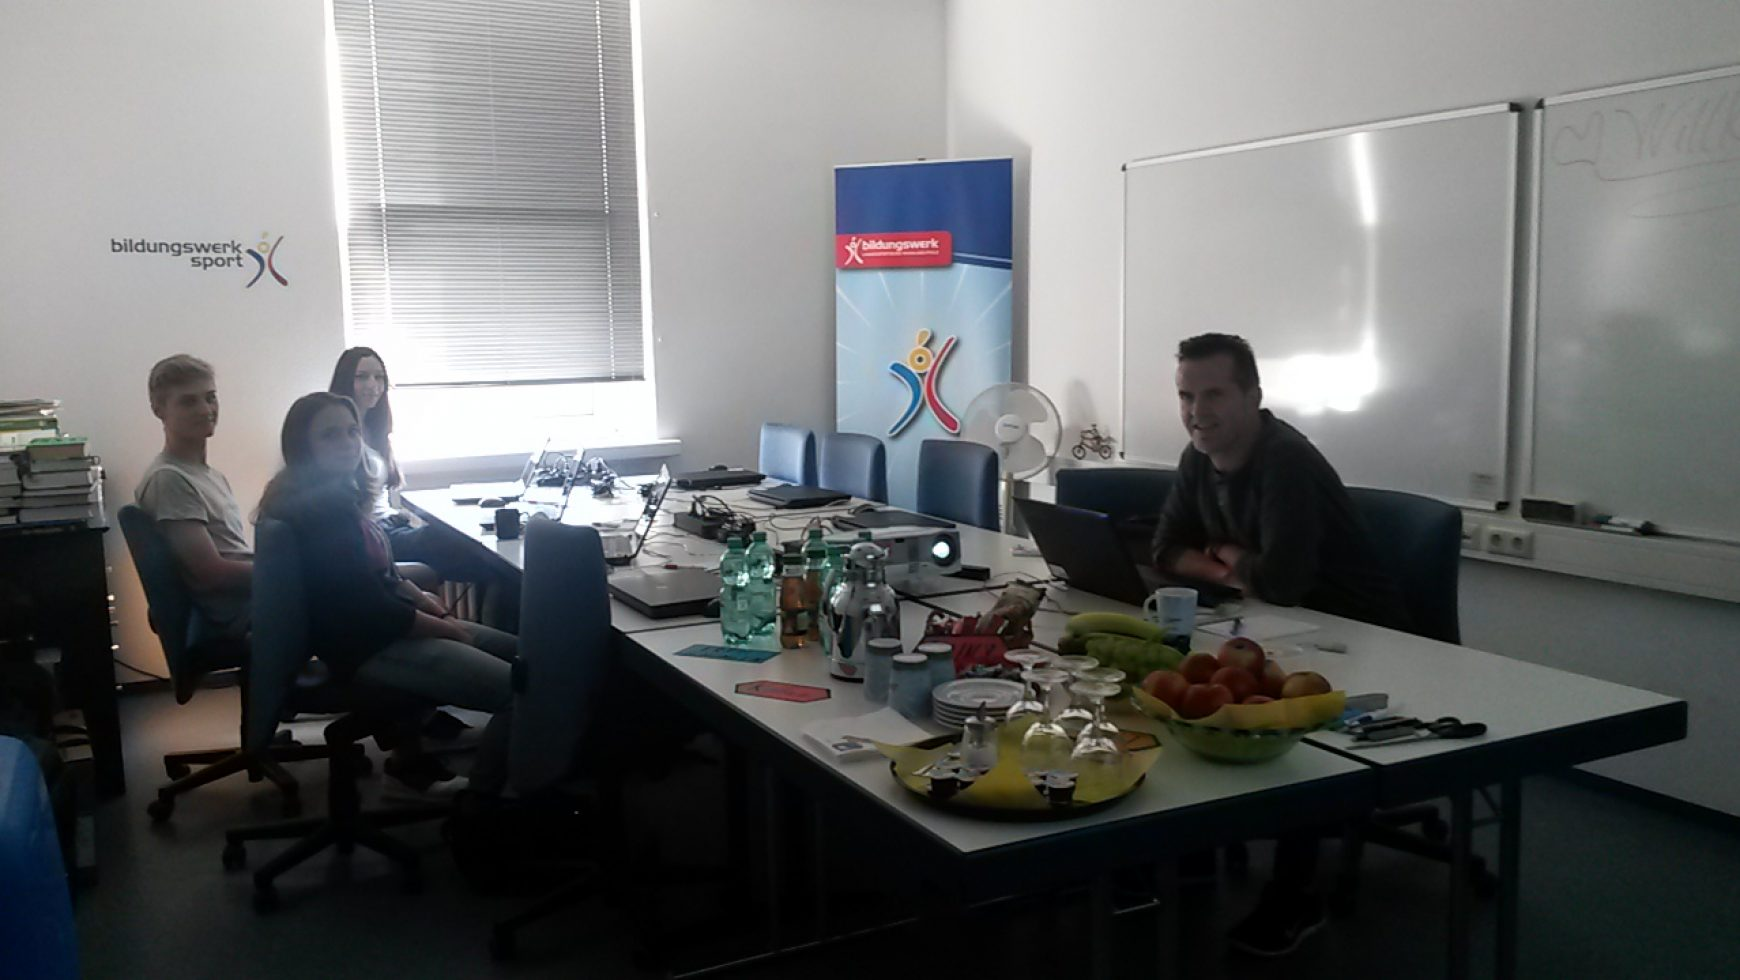 Adobe Photoshop CS5 – Kompakt | Das Seminar in Trier